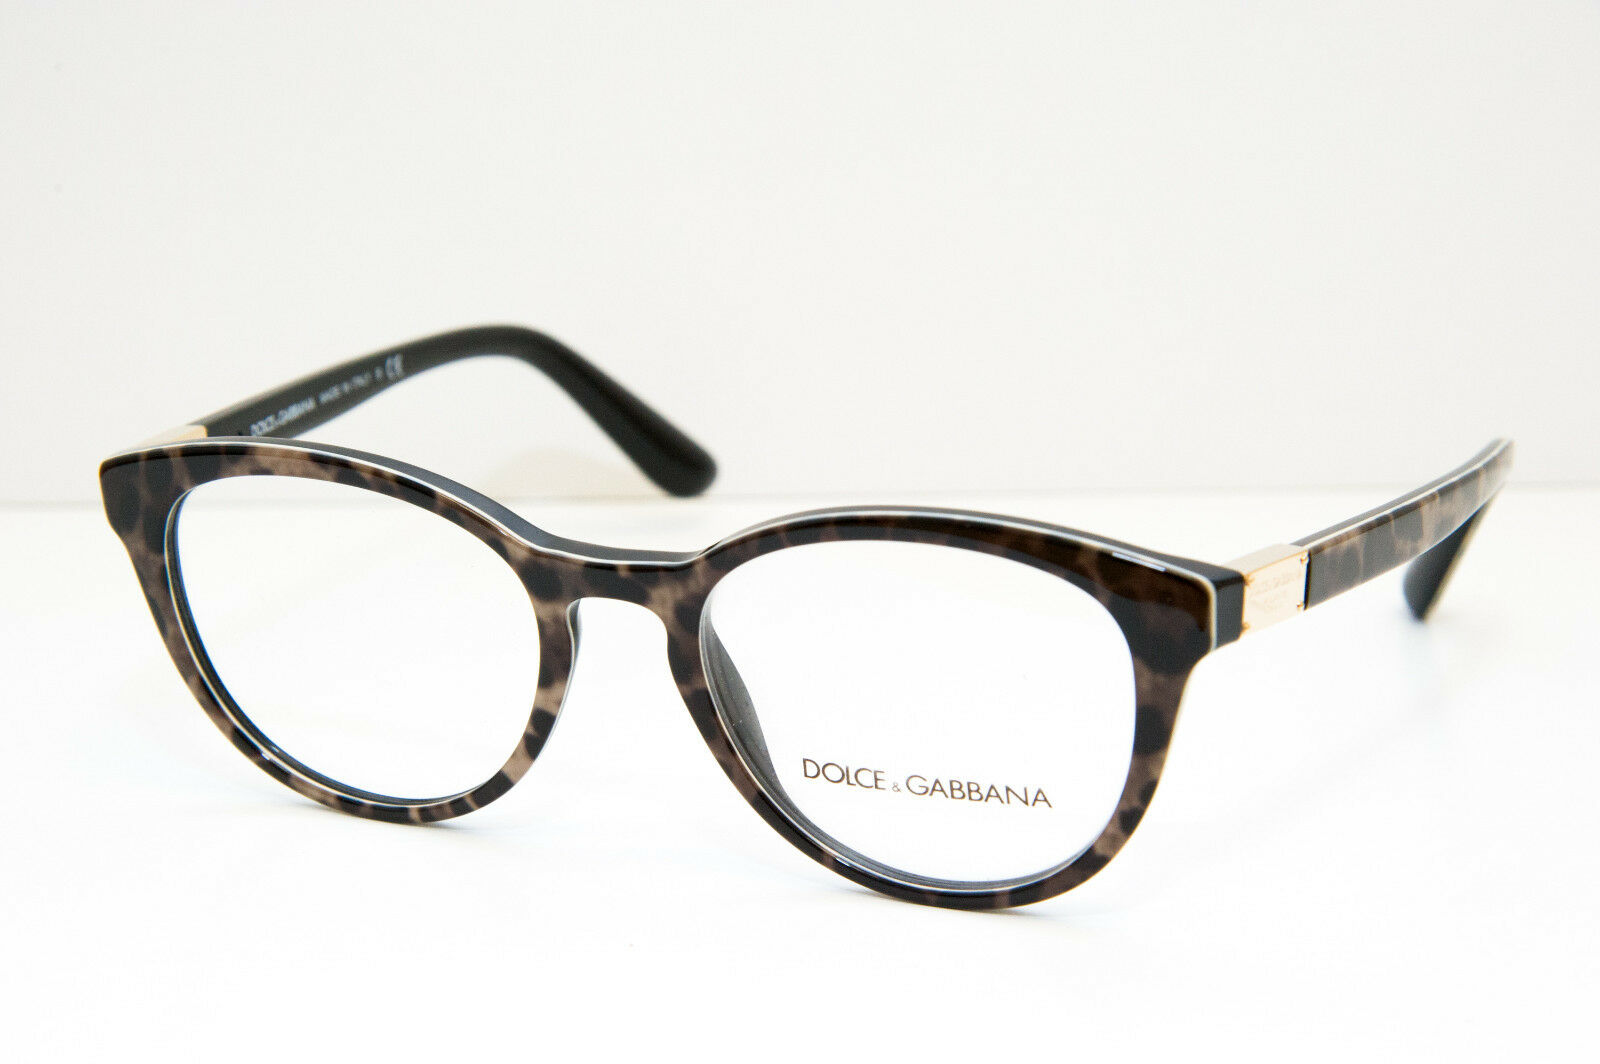 Occhiali da Vista Prodesign 1793 3041 nYKnP2XjW